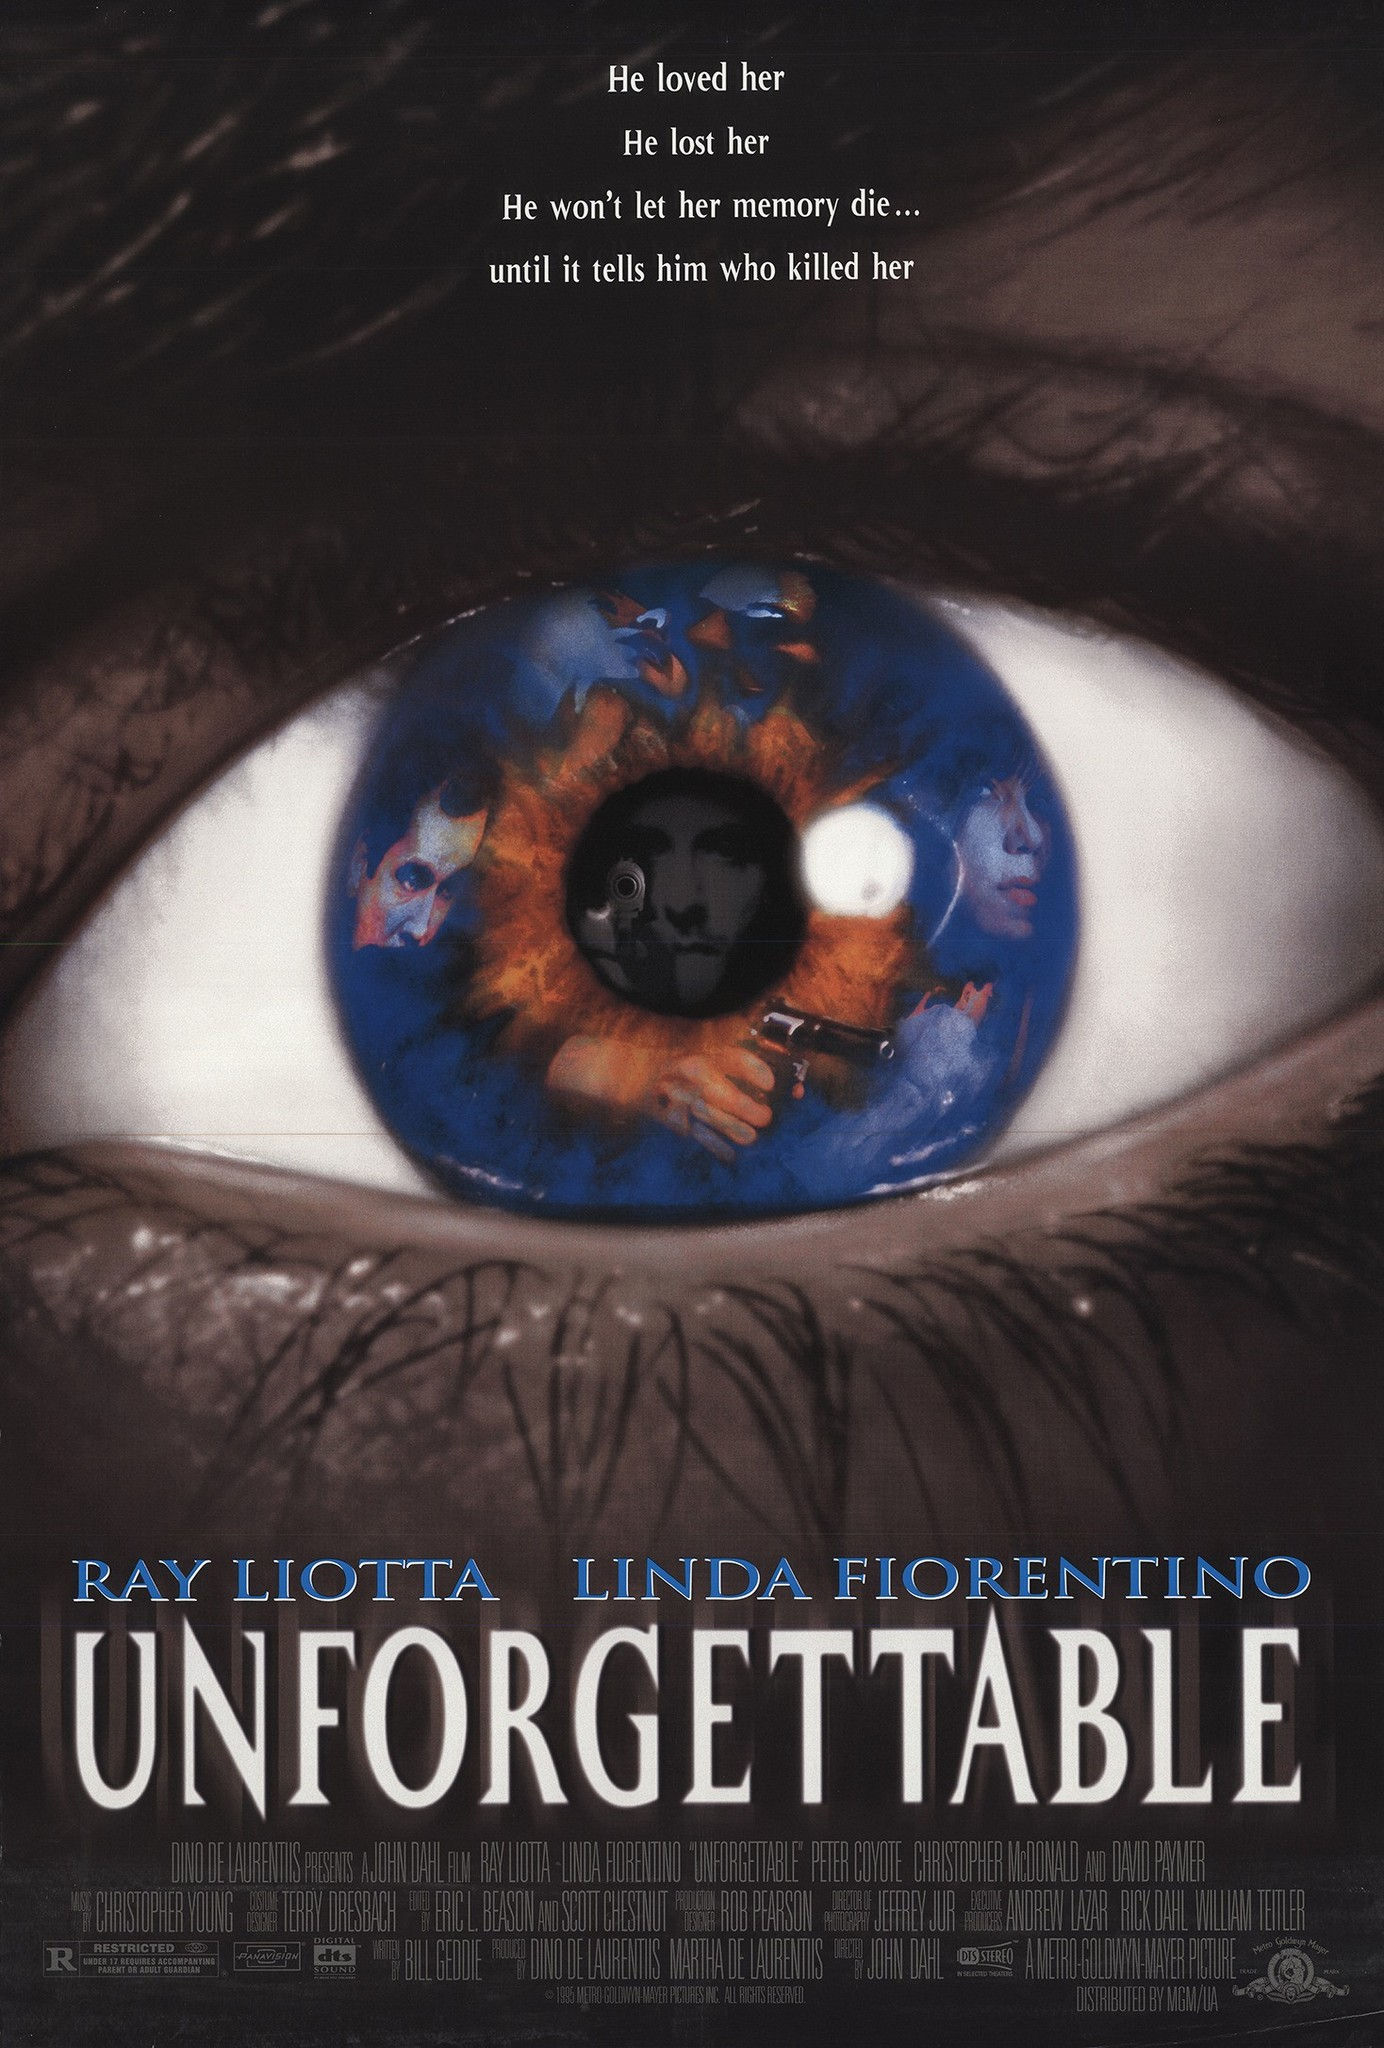 Linda Fiorentino and Ray Liotta in Unforgettable (1996)